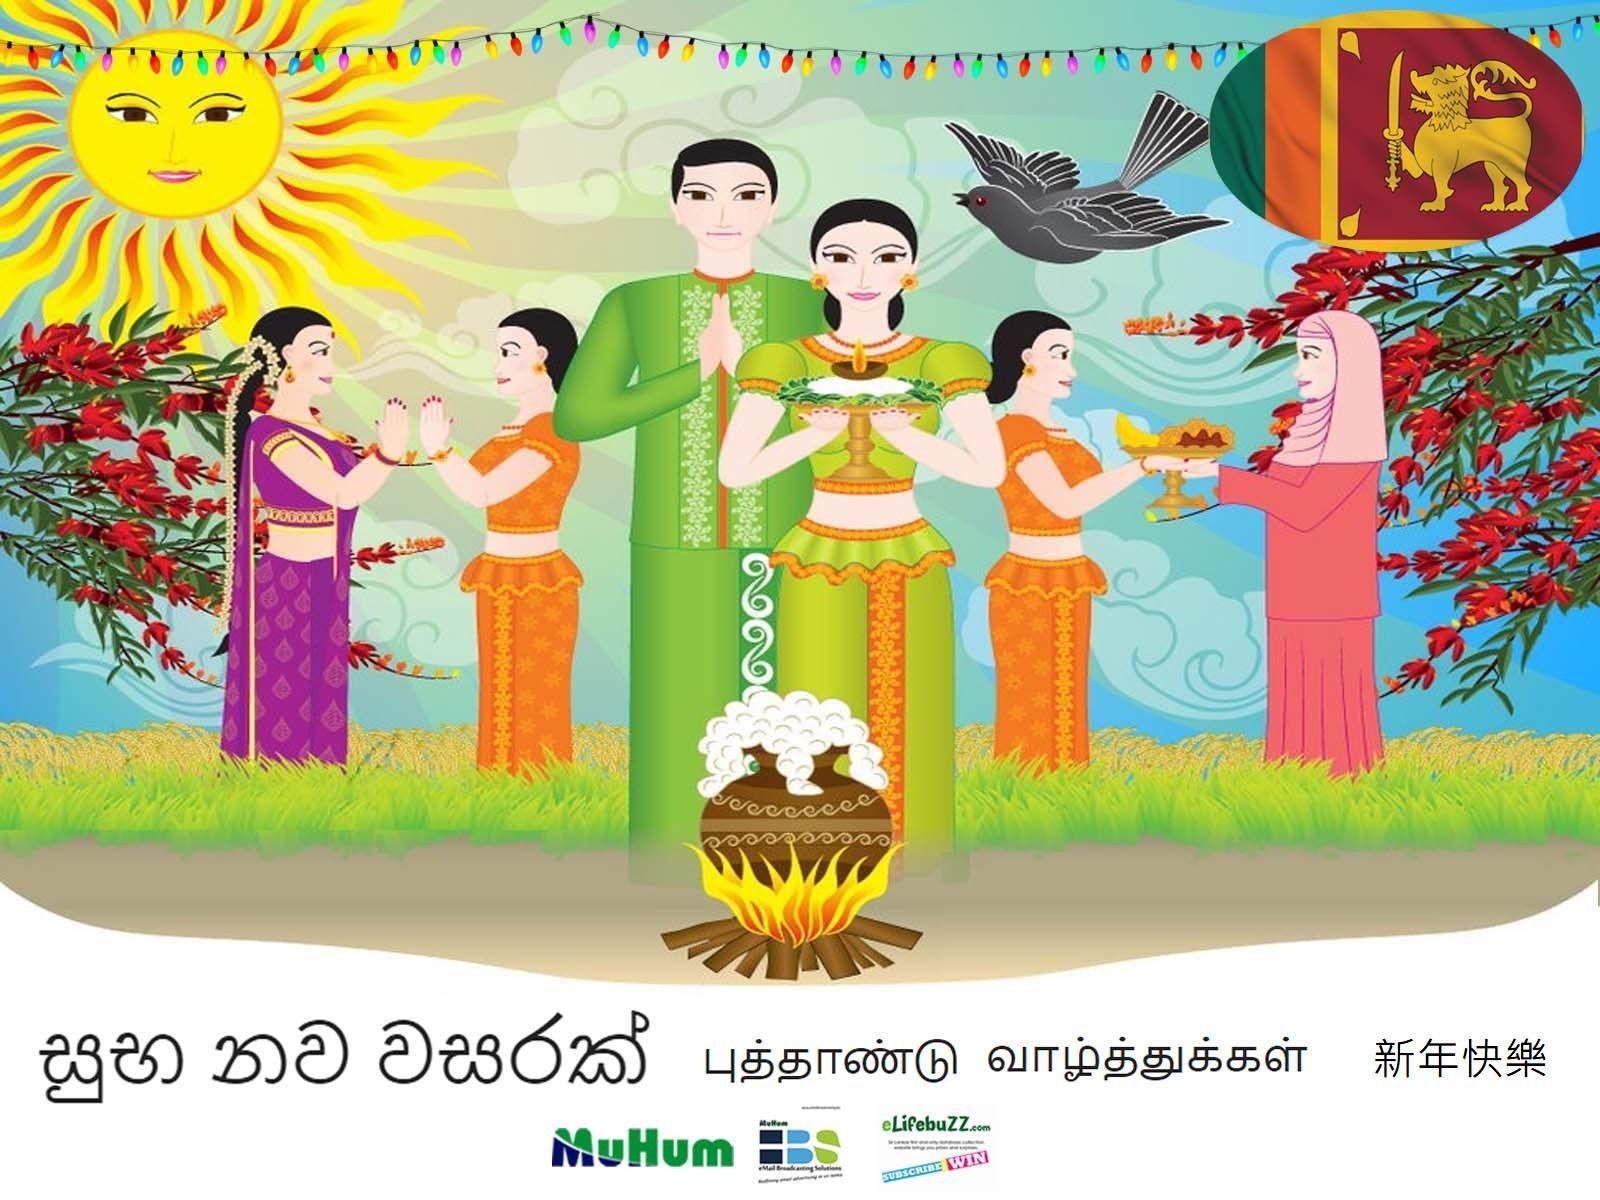 Pin By Senarath Bandara On Beautiful Nature In 2020 Sinhala New Year Wishes Sinhala Tamil New Year New Year Wishes